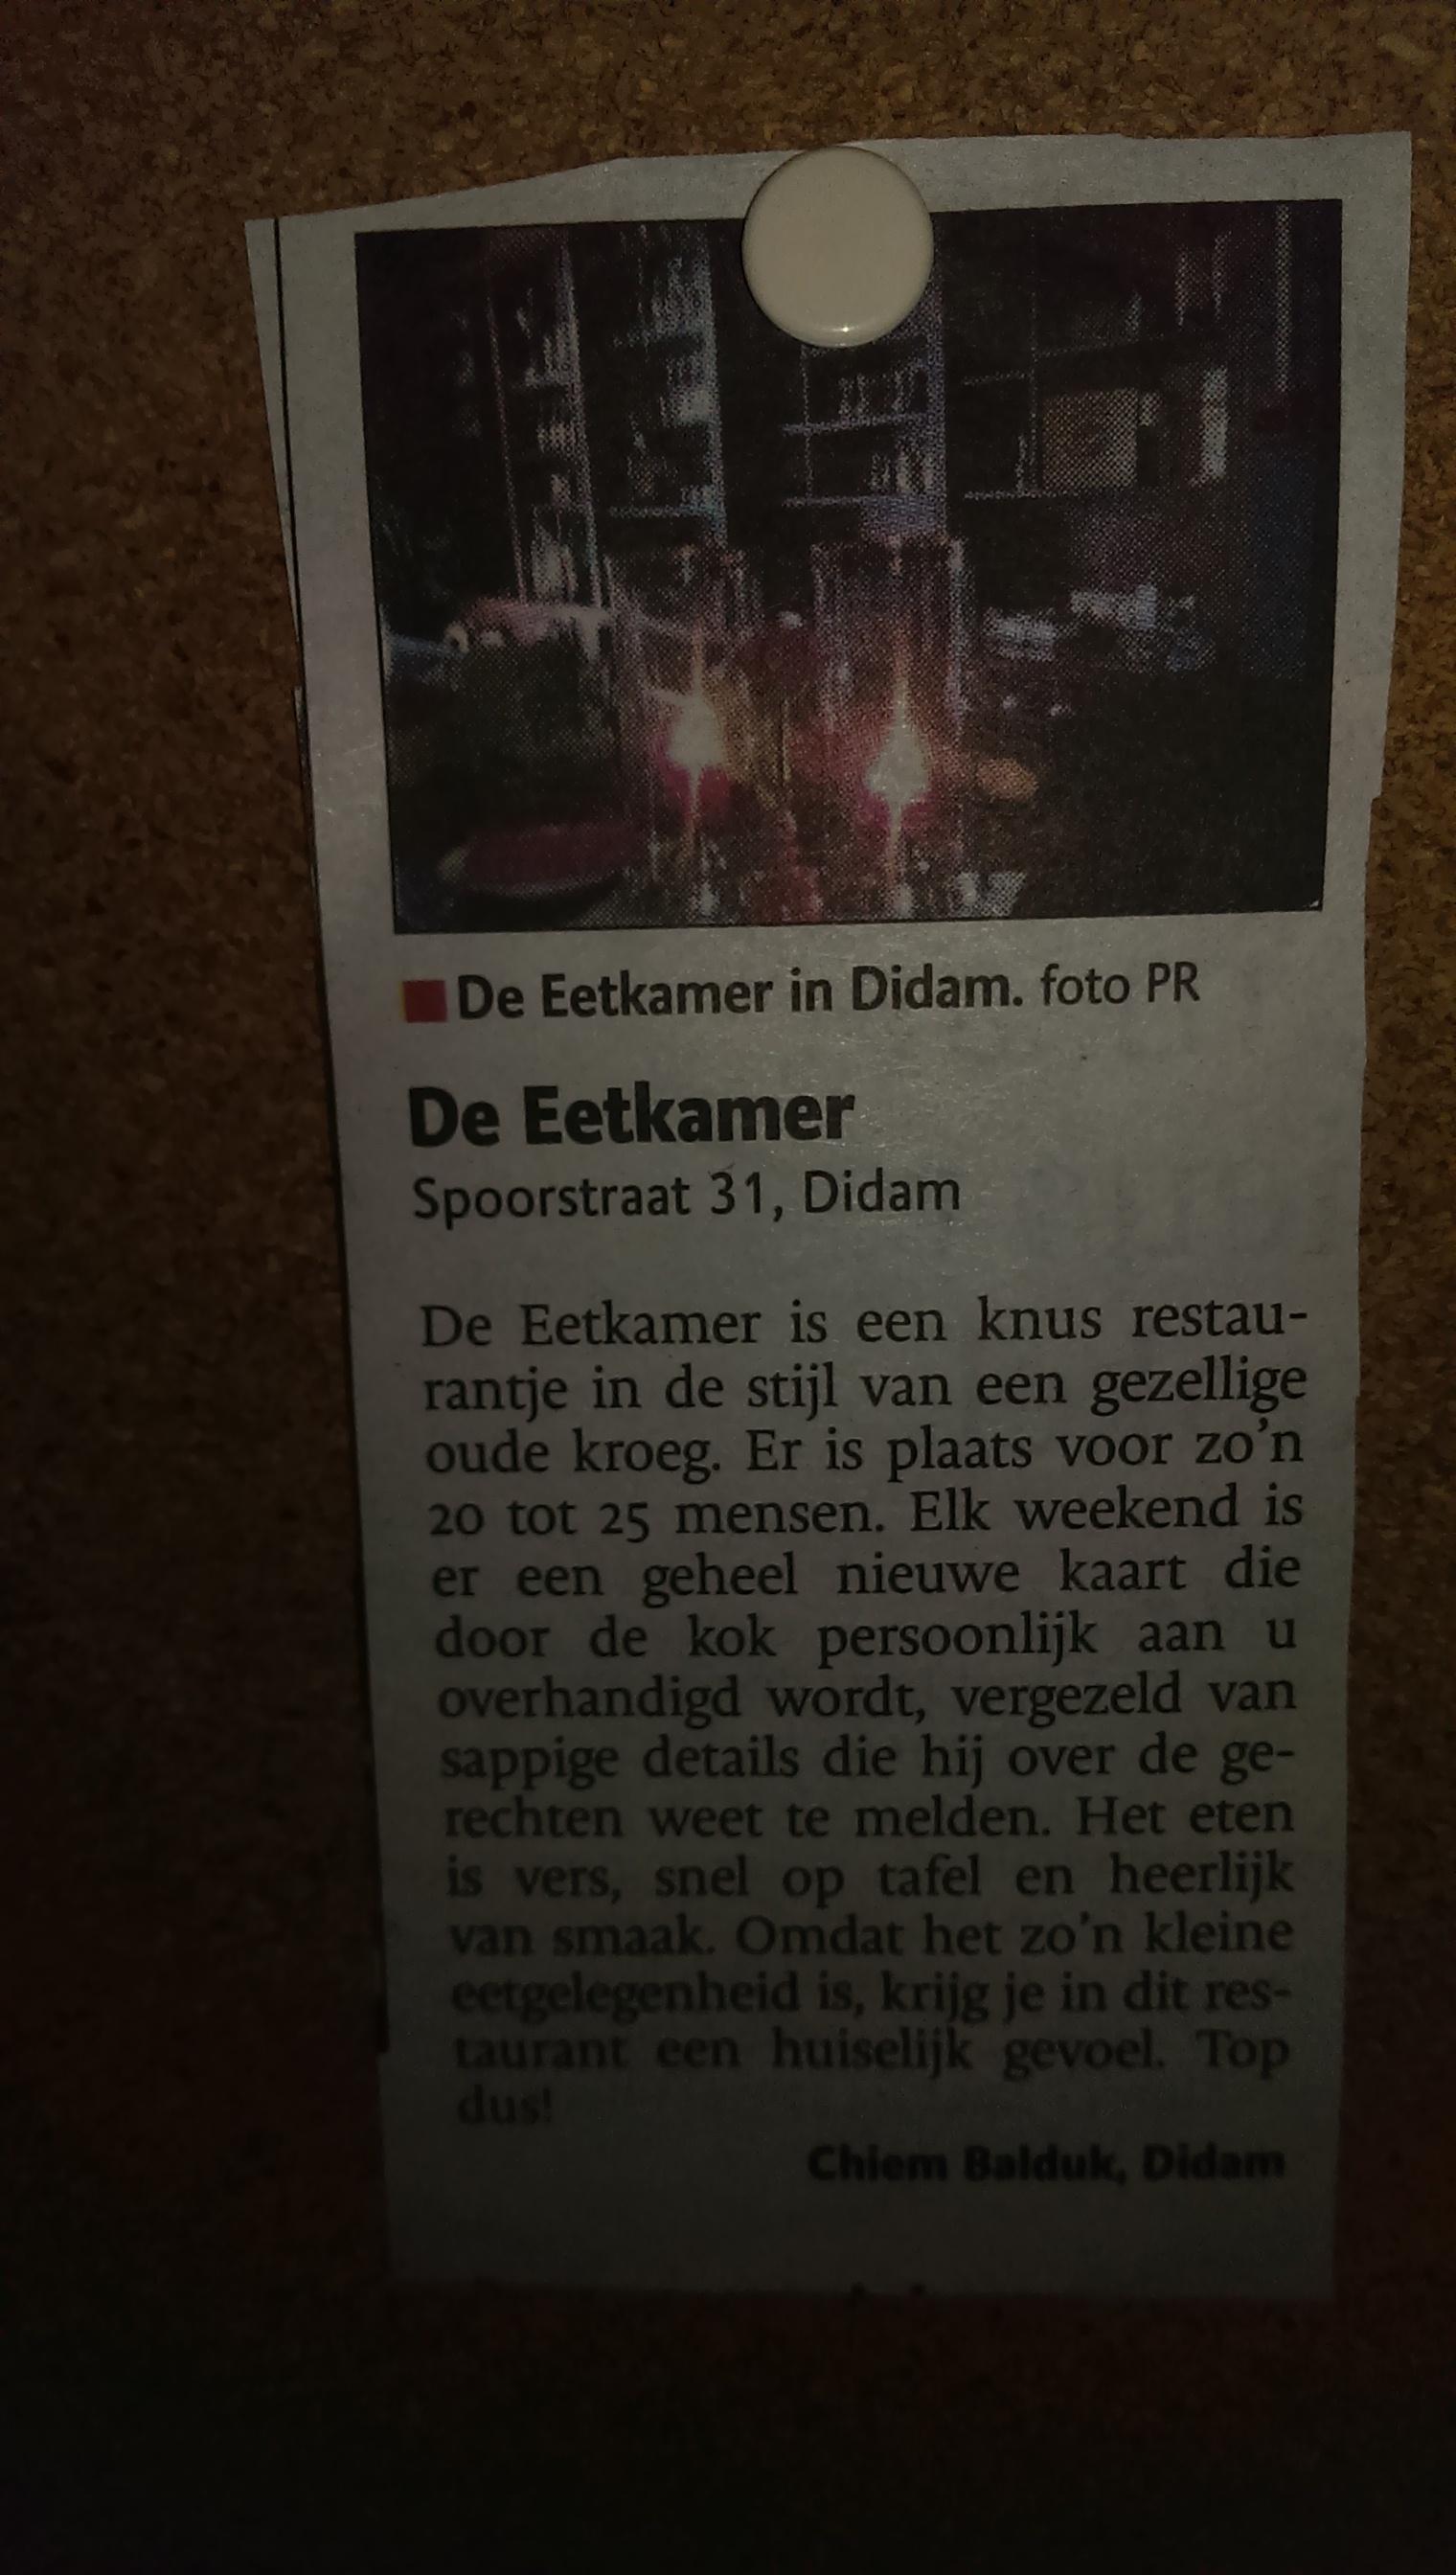 Emejing De Eetkamer Didam Images - Serviredprofesional.com ...